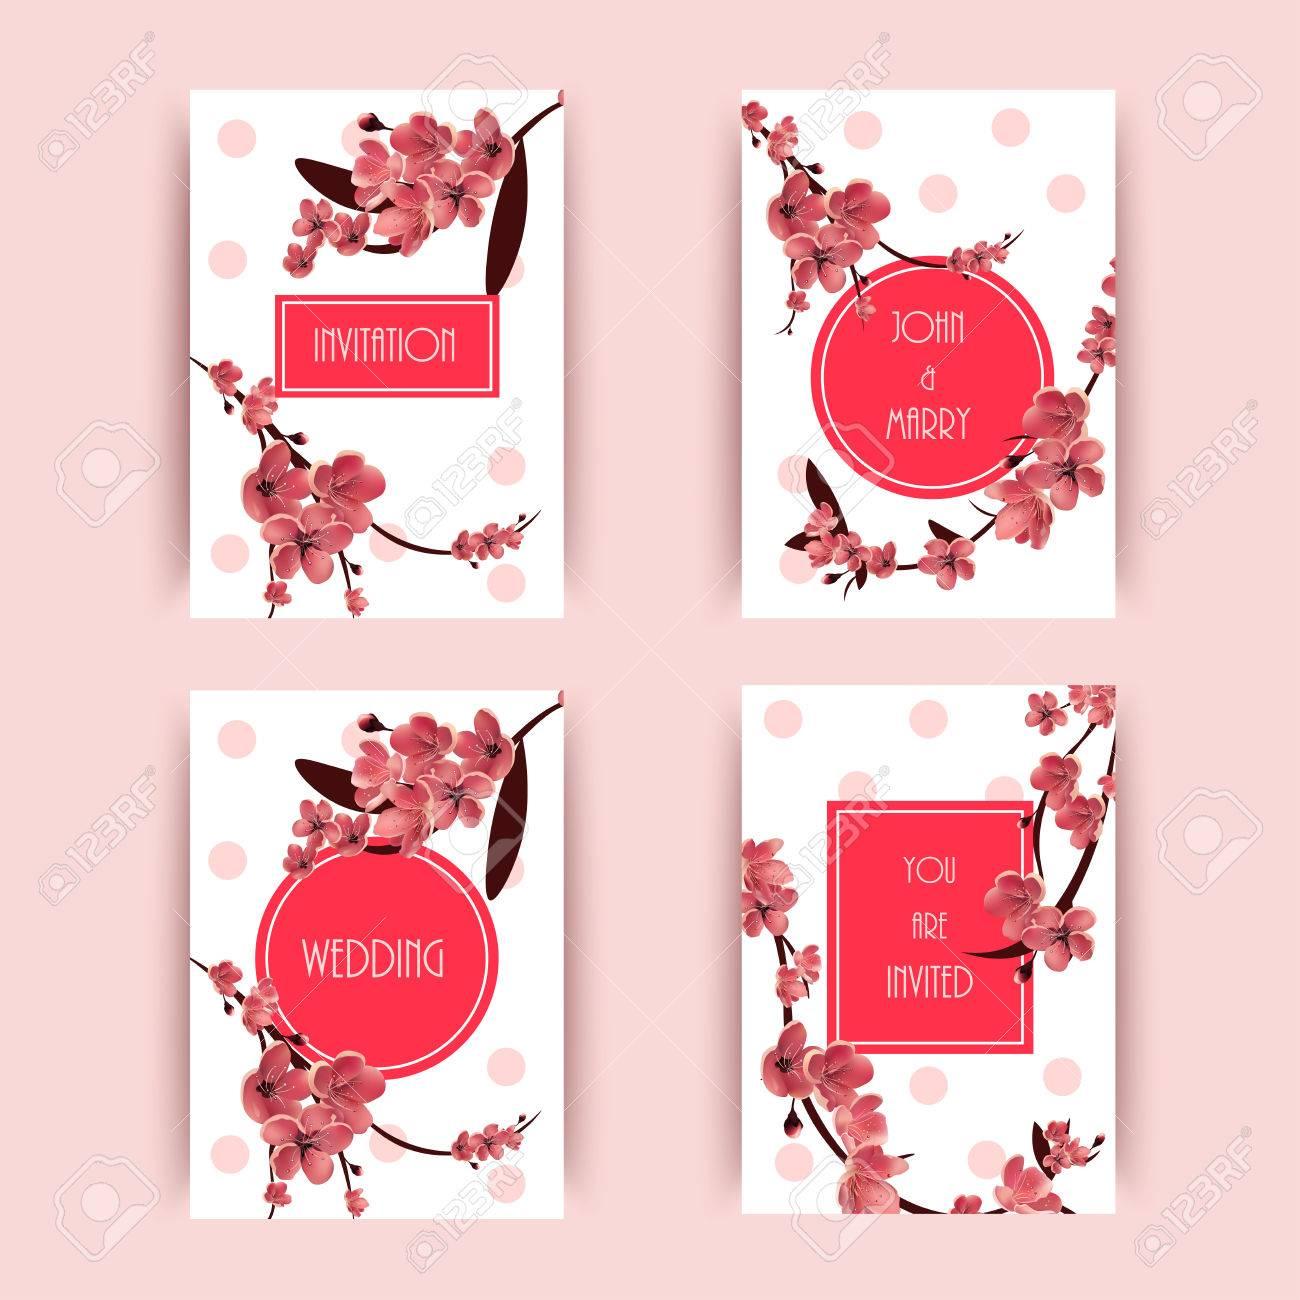 Sakura, Cherry Blossoming Tree Vector Background Illustration ...